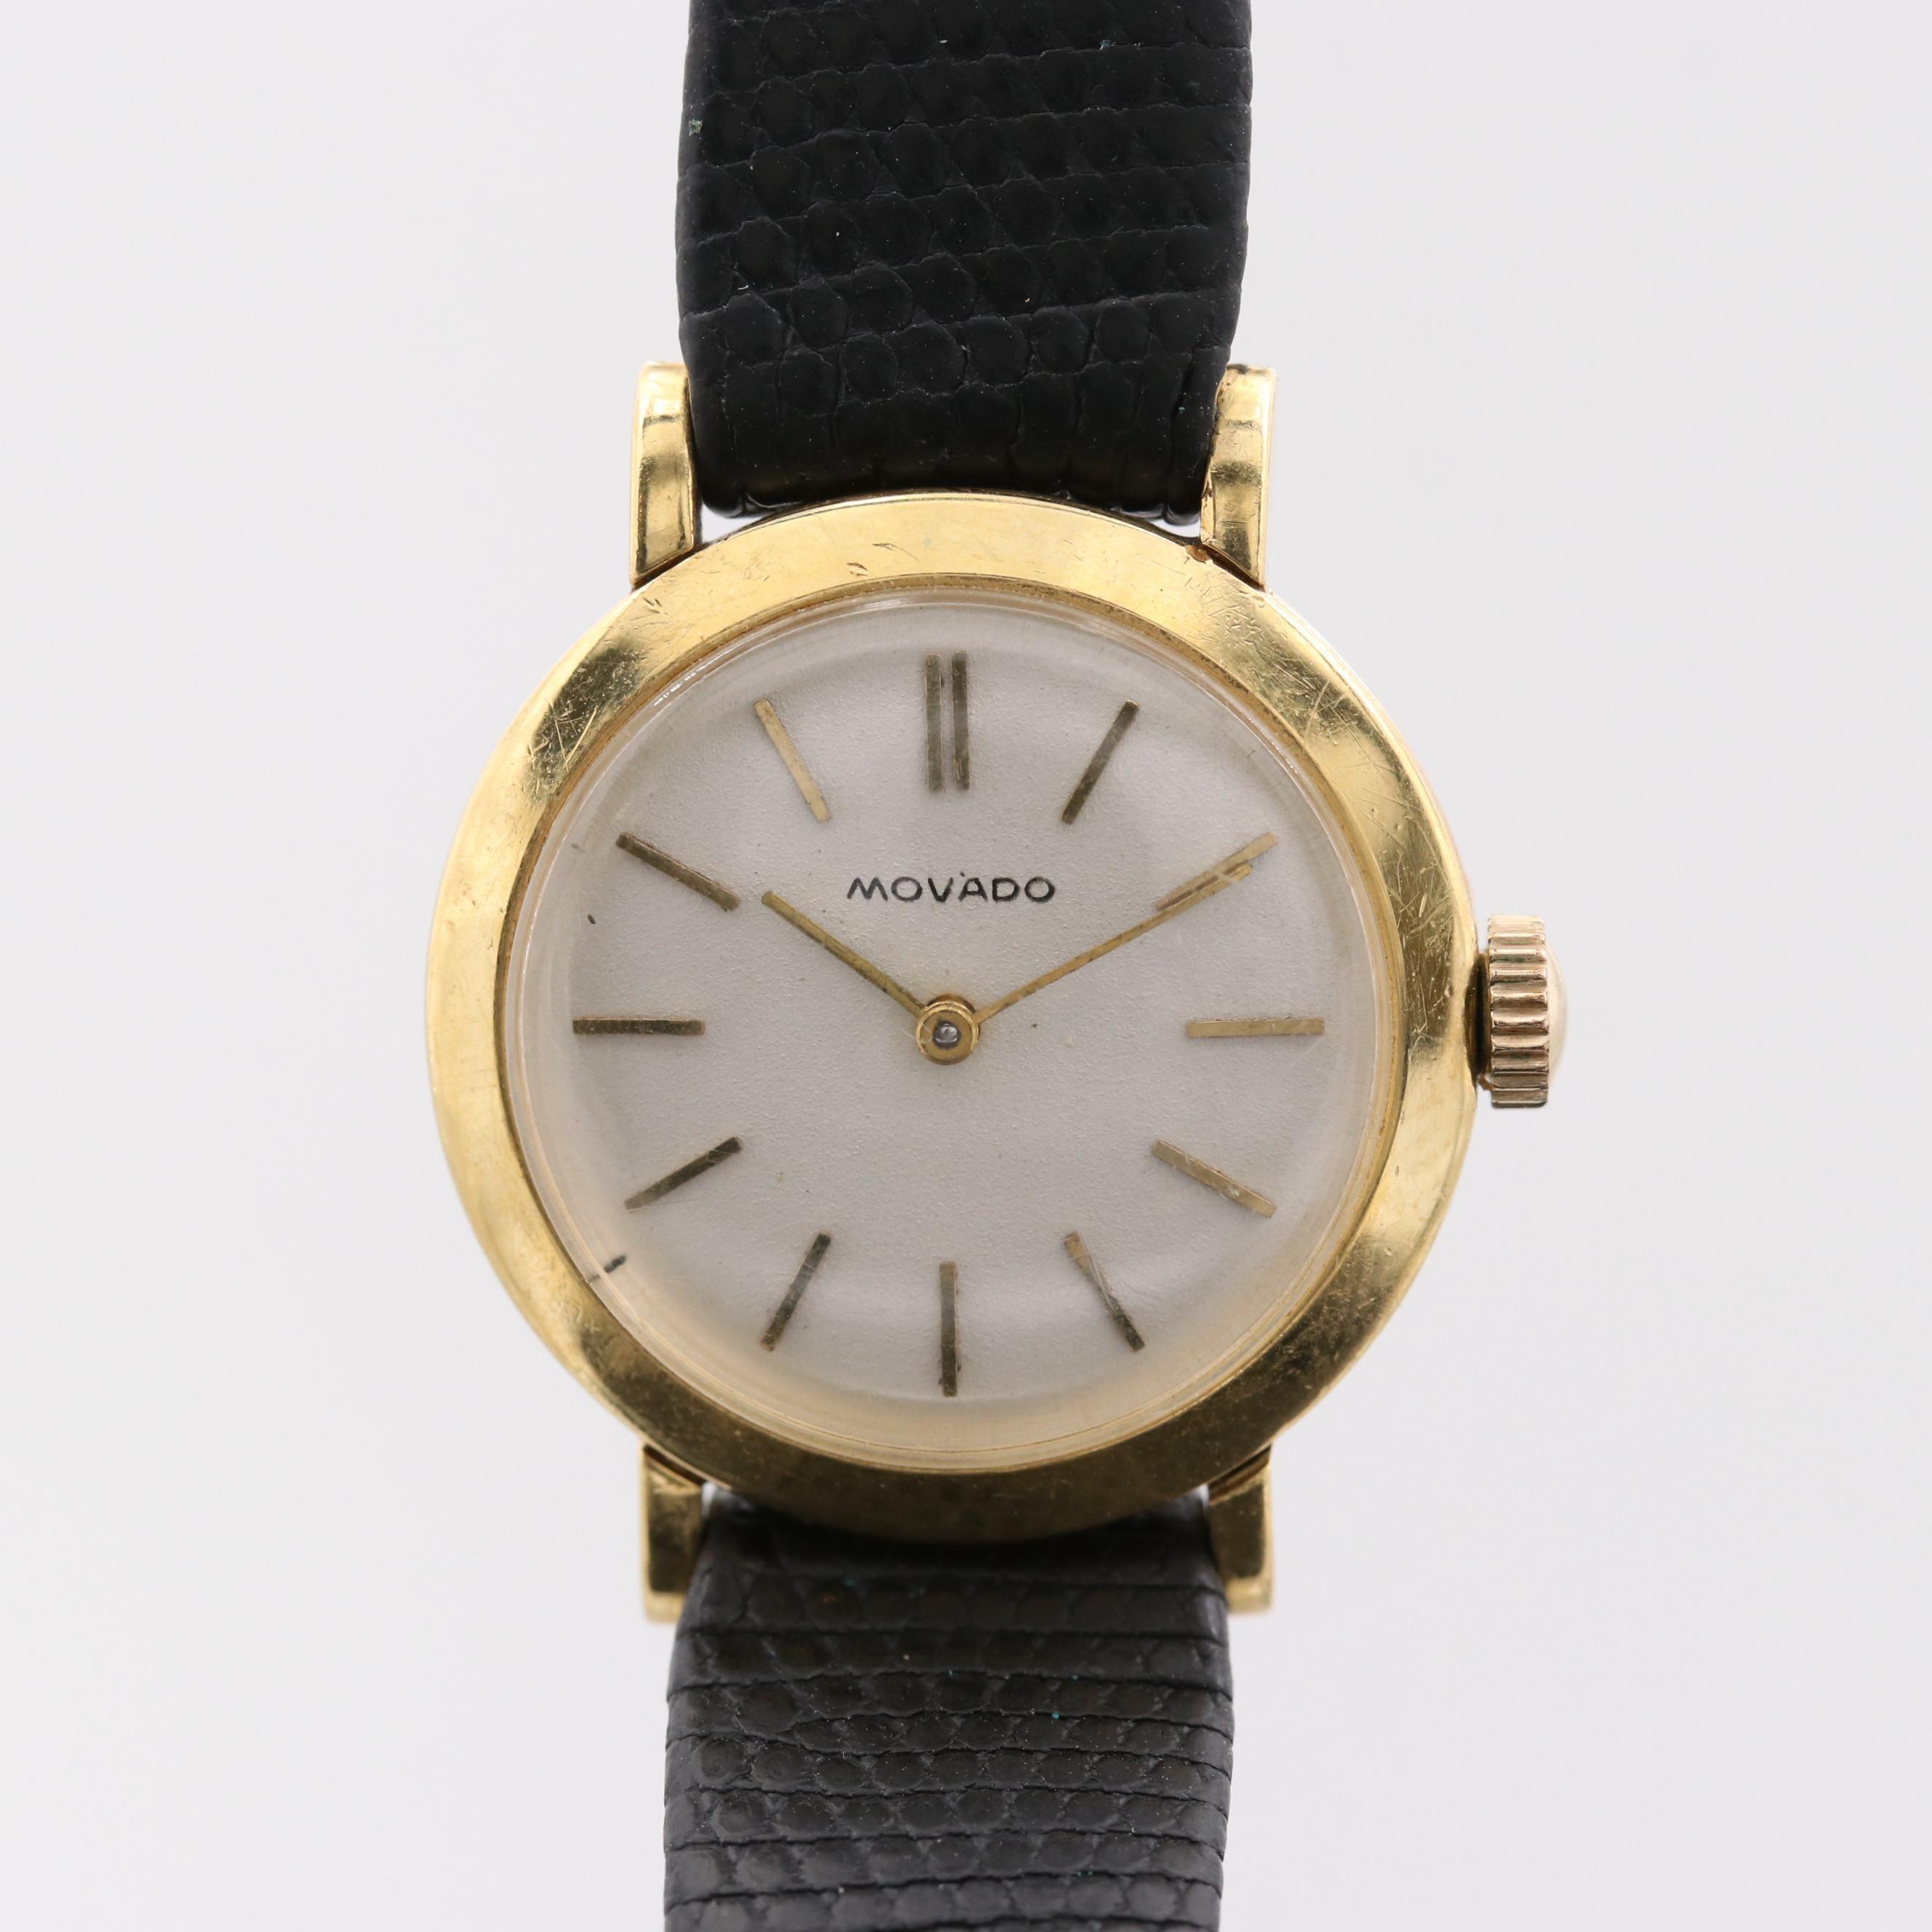 Vintage Movado 18K Yellow Gold Stem Wind Wristwatch